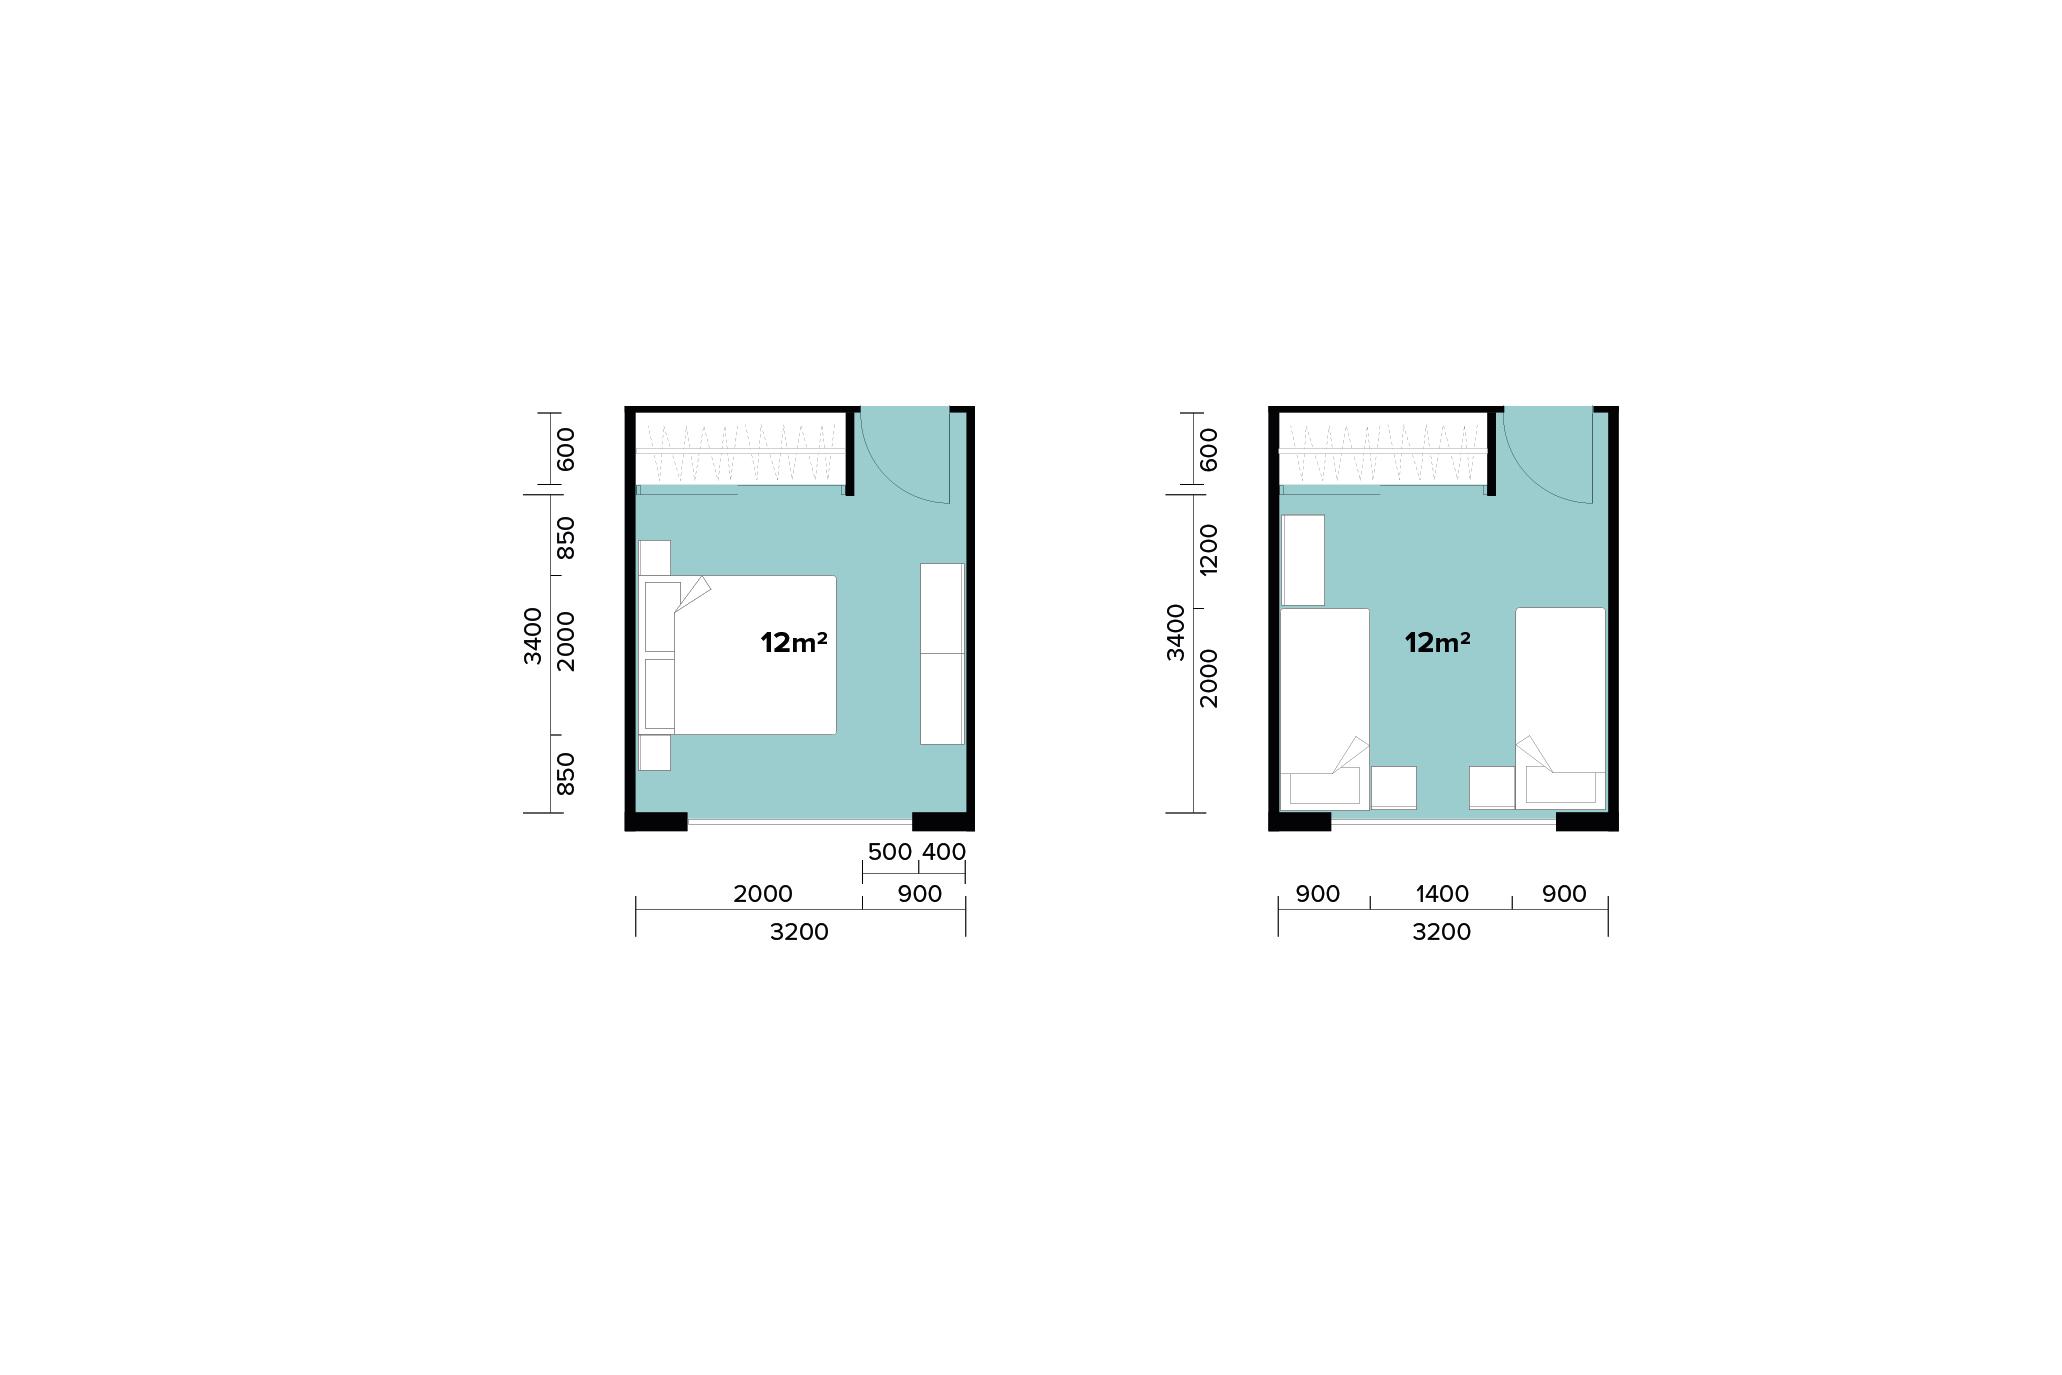 Bedrooms Auckland Design Manual